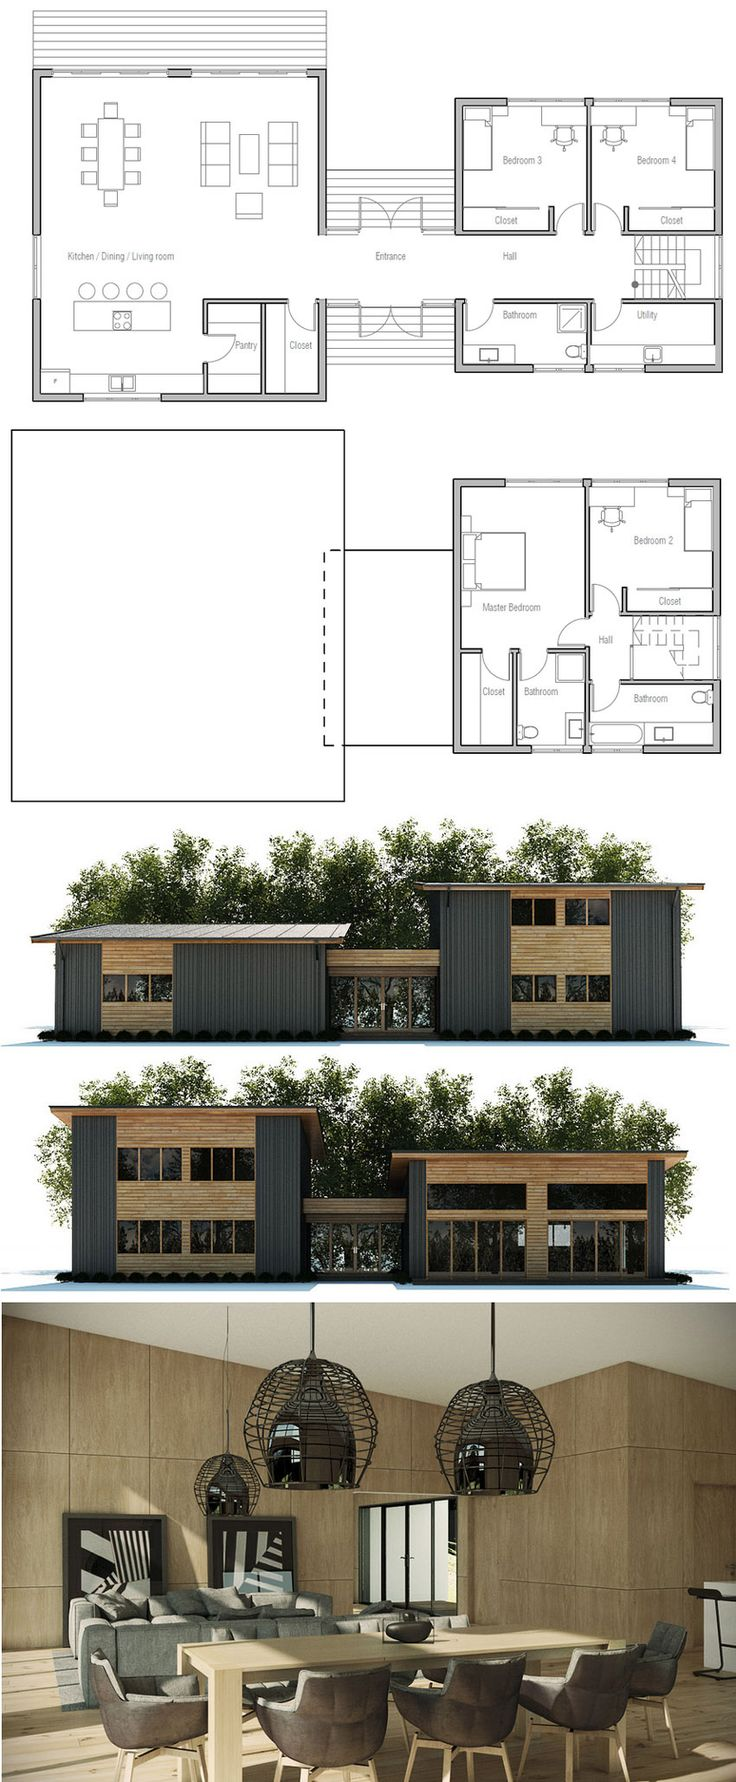 House Plan CH364